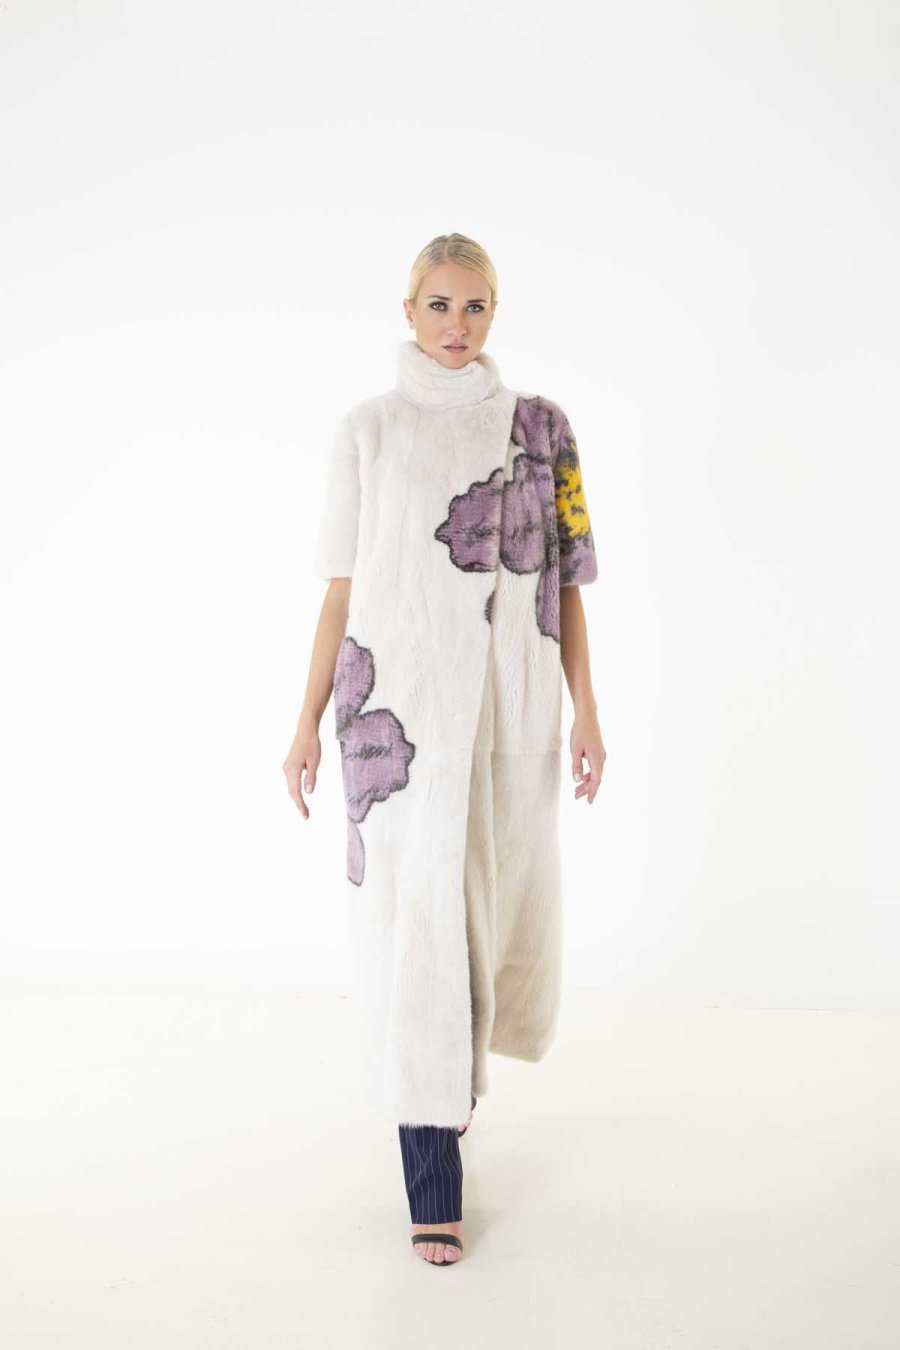 Beige Male Mink Coat | Шуба из норки бежевого цвета - Sarigianni Furs